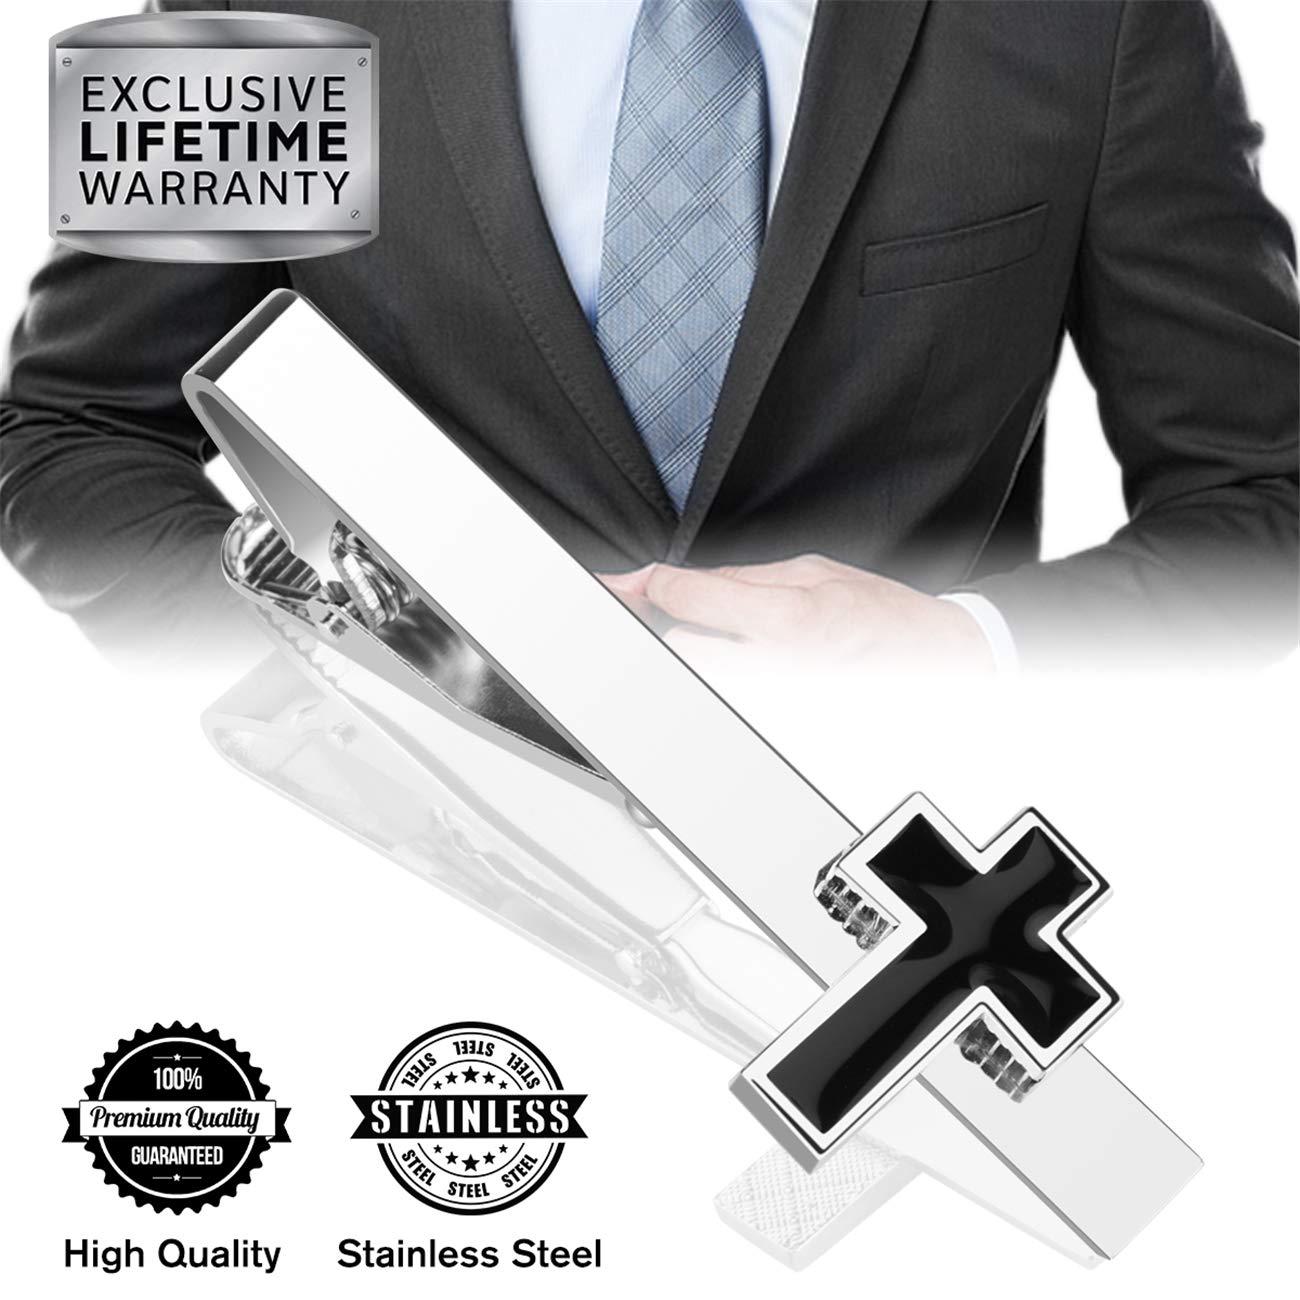 fa0b22d20078 MGStyle Tie Clip, Tie Bar, Tie Clips for Men, Tie Bars for Men, Mens Tie  Clip Silver, Bar Tie Clip Gold, Tie Bar Clip, Tie-Clip for Women, ...